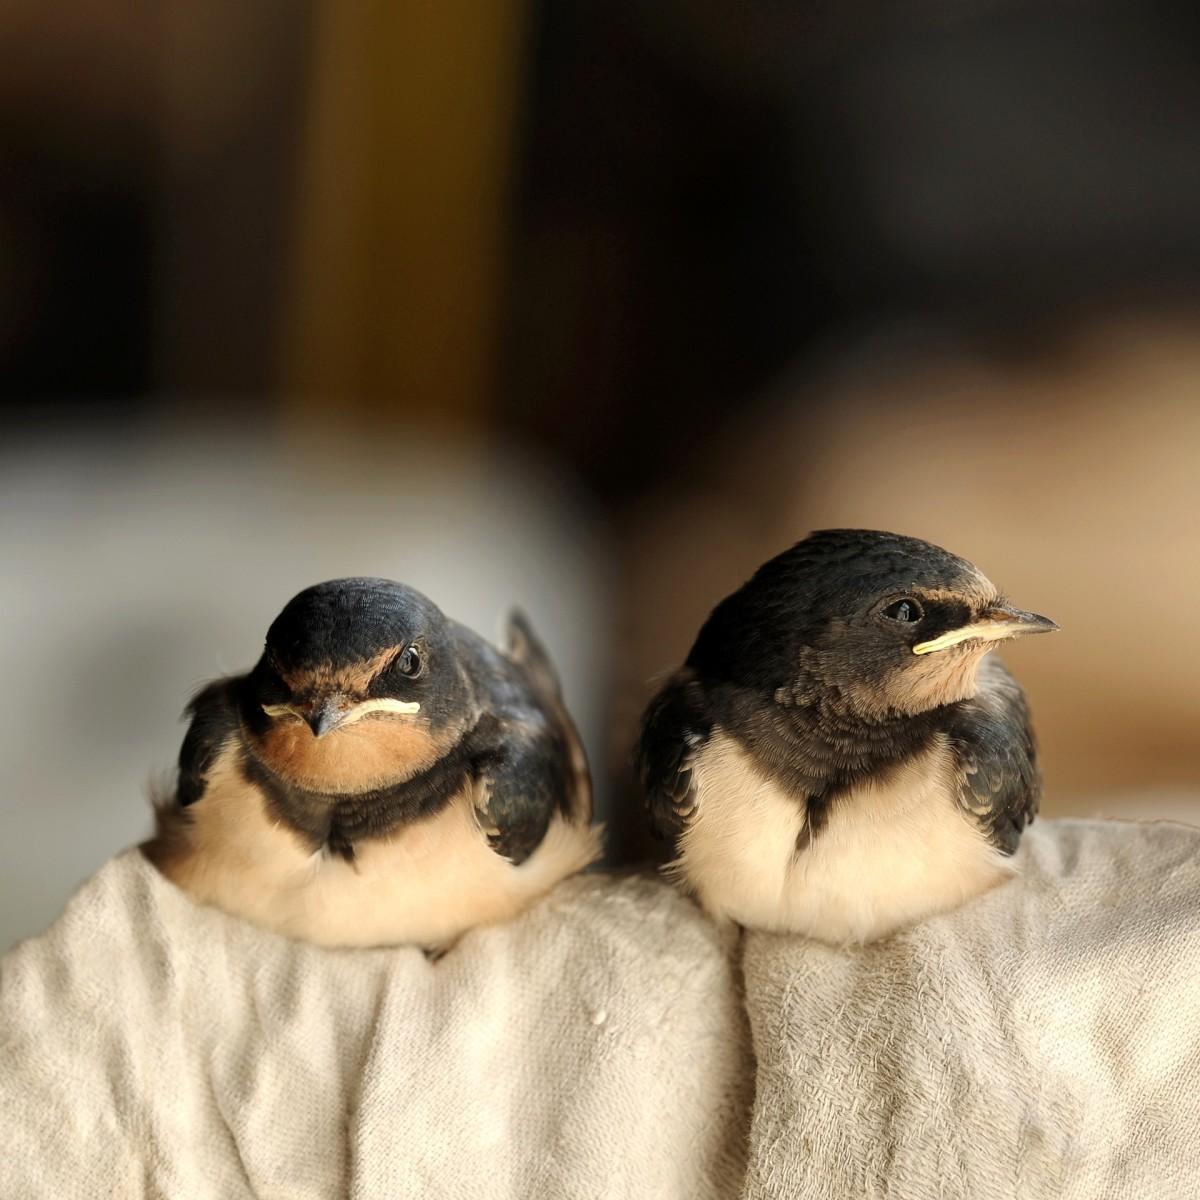 Barn swallows eat mosquitos.